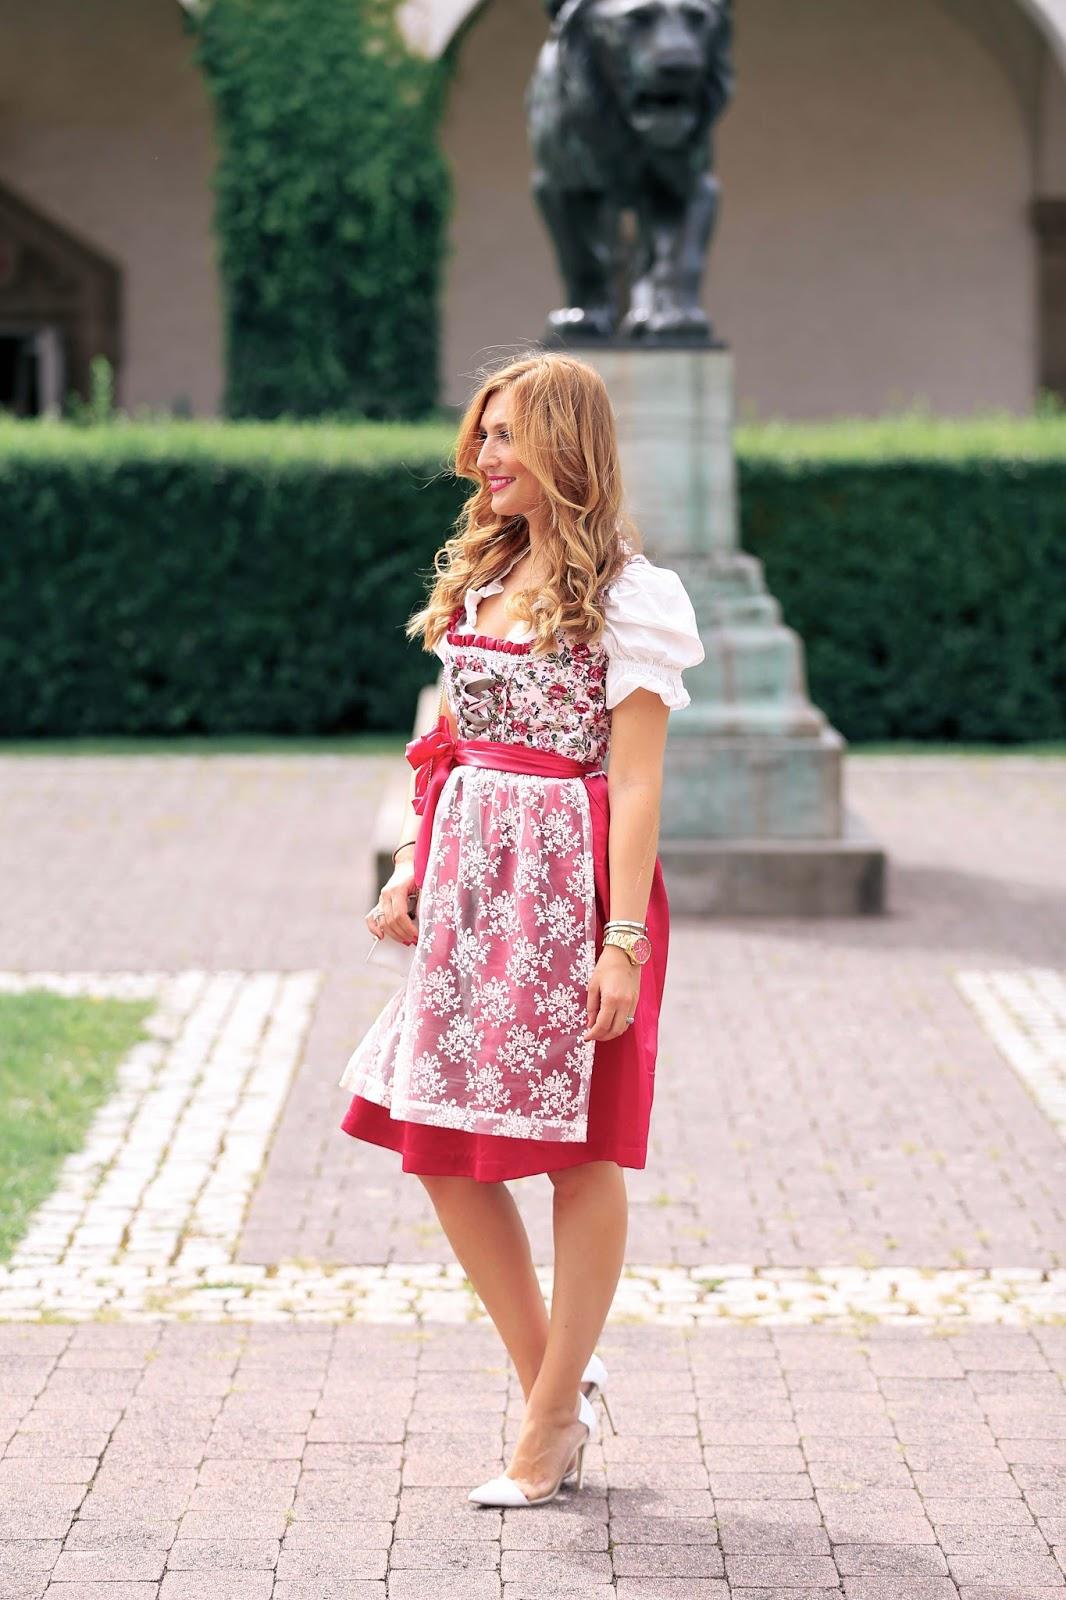 Bloggerstyle-wiesn-inspiration-pinkes-dirndl-fashionstylebyjohanna-blogger-aus-frankfurt